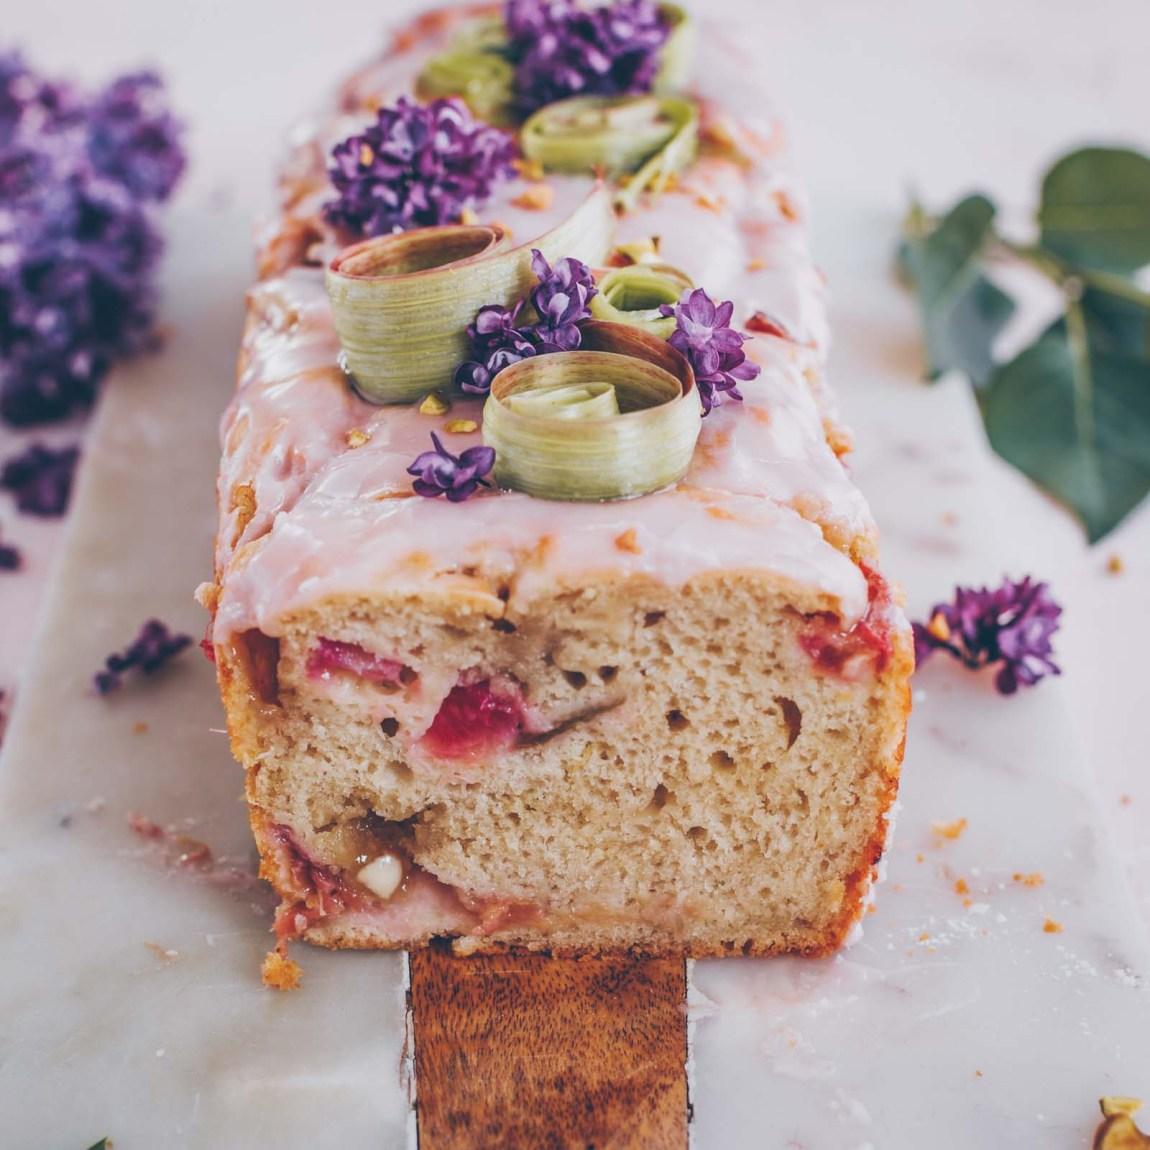 Veganer Rhabarber Joghurt Kuchen